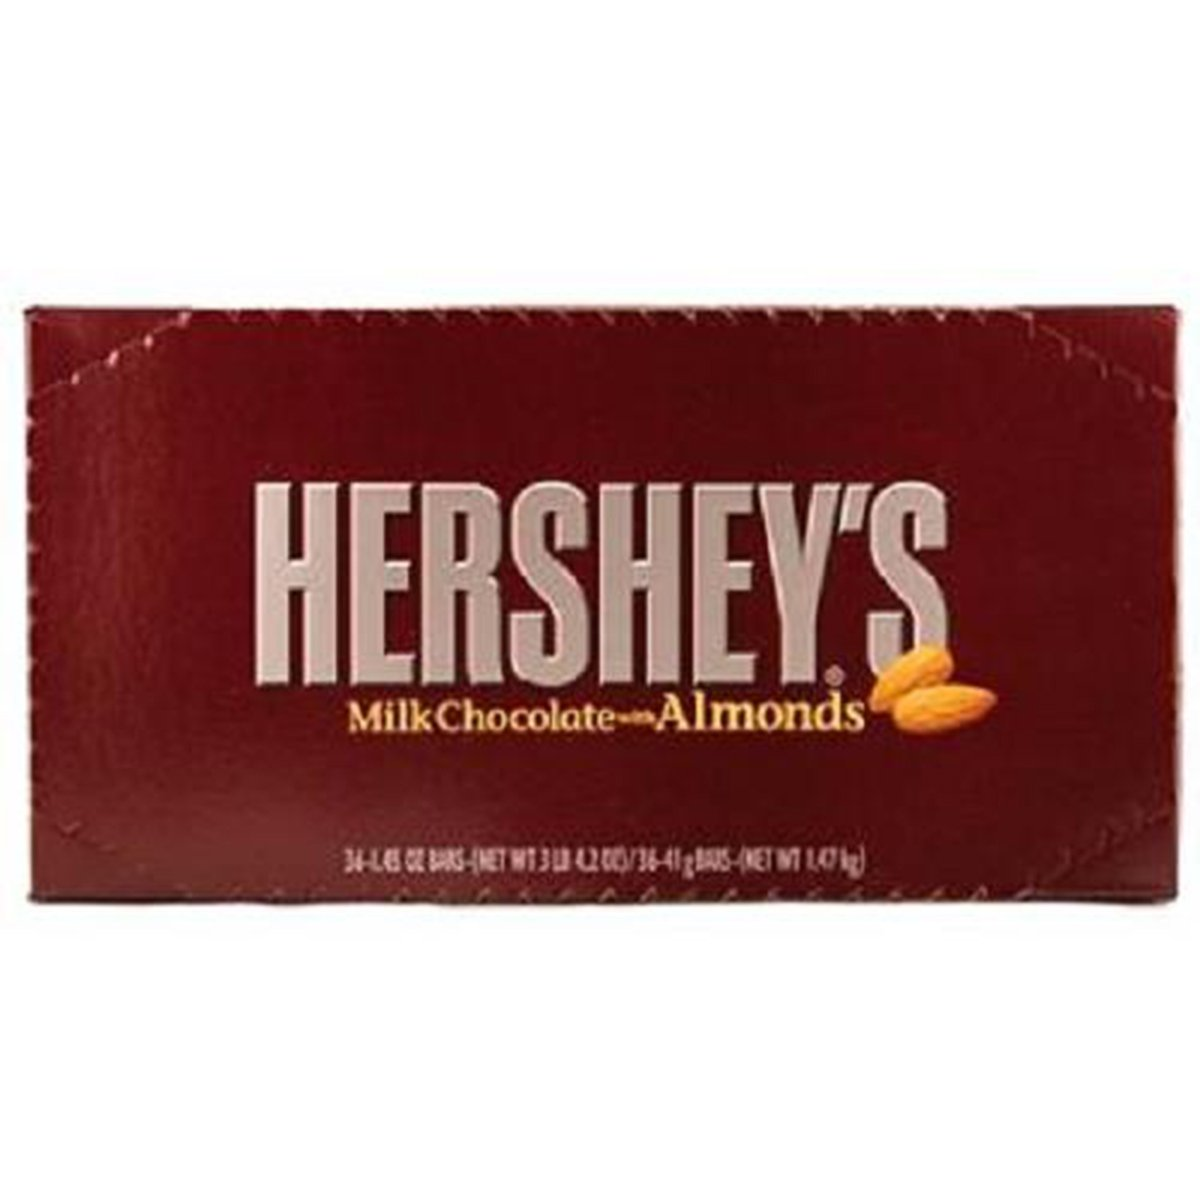 Product Of Hersheys, Milk Chocolate Almonds Bar, Count 36 (1.45 oz) - Chocolate Candy / Grab Varieties & Flavors